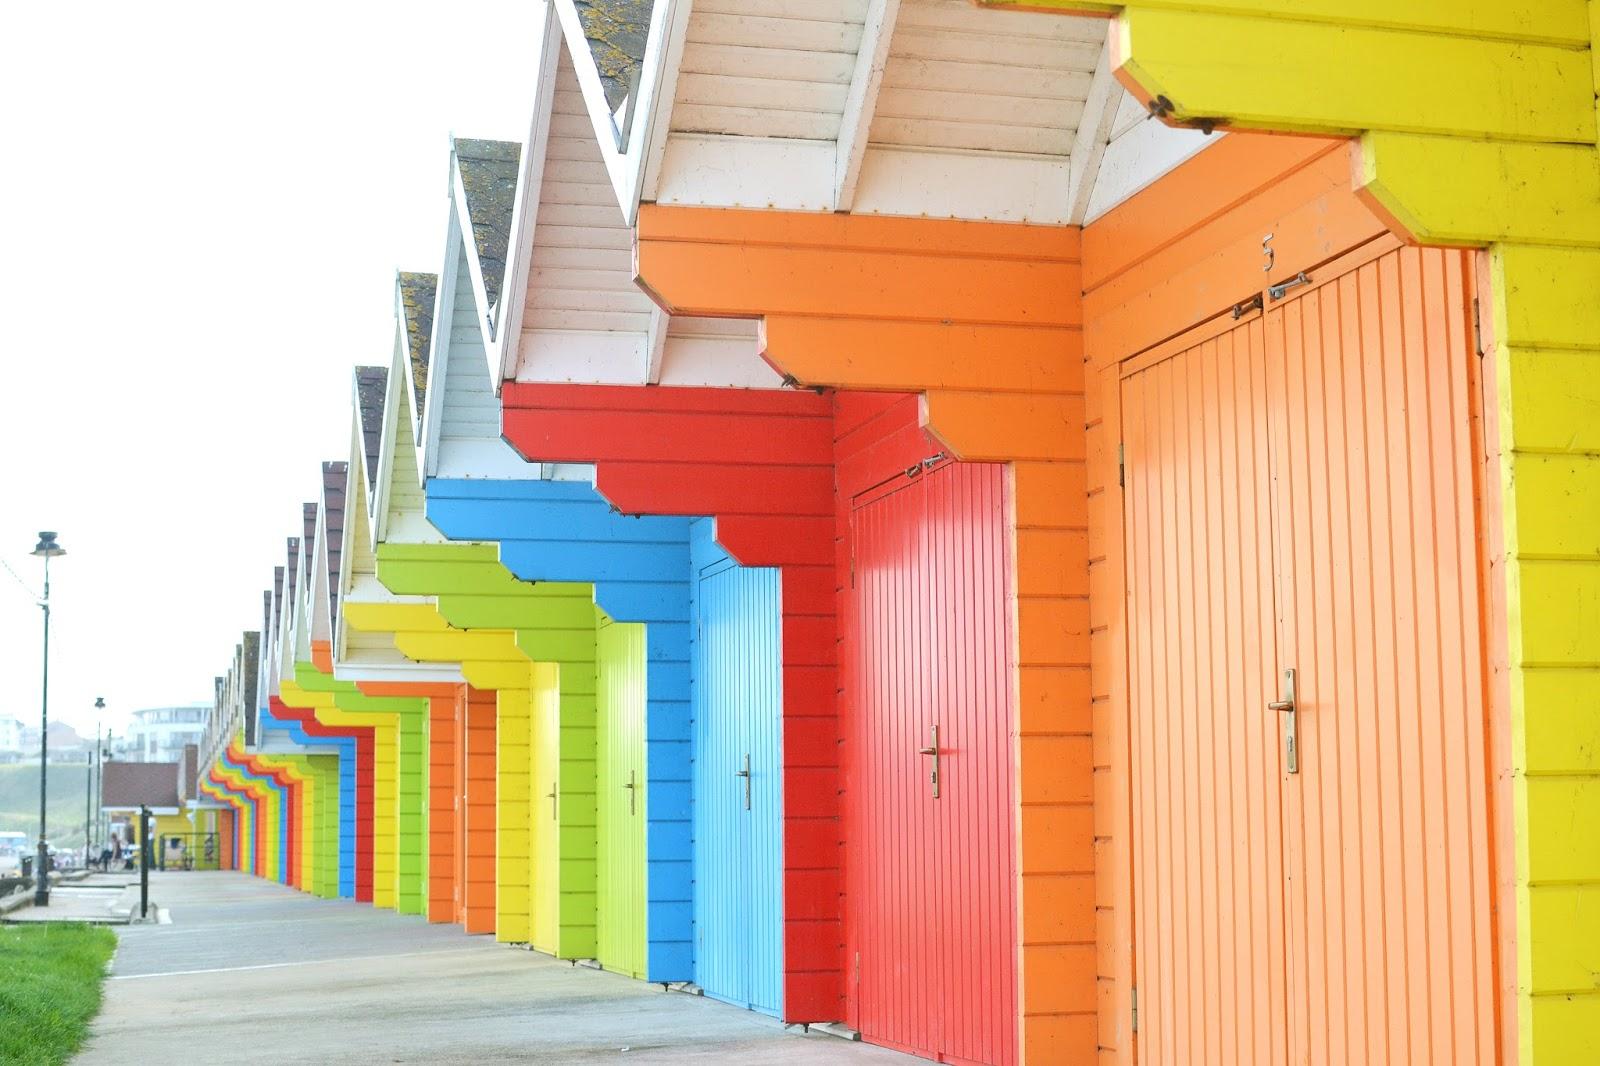 colourful beach huts, scarborough chalets, scarborough beach huts